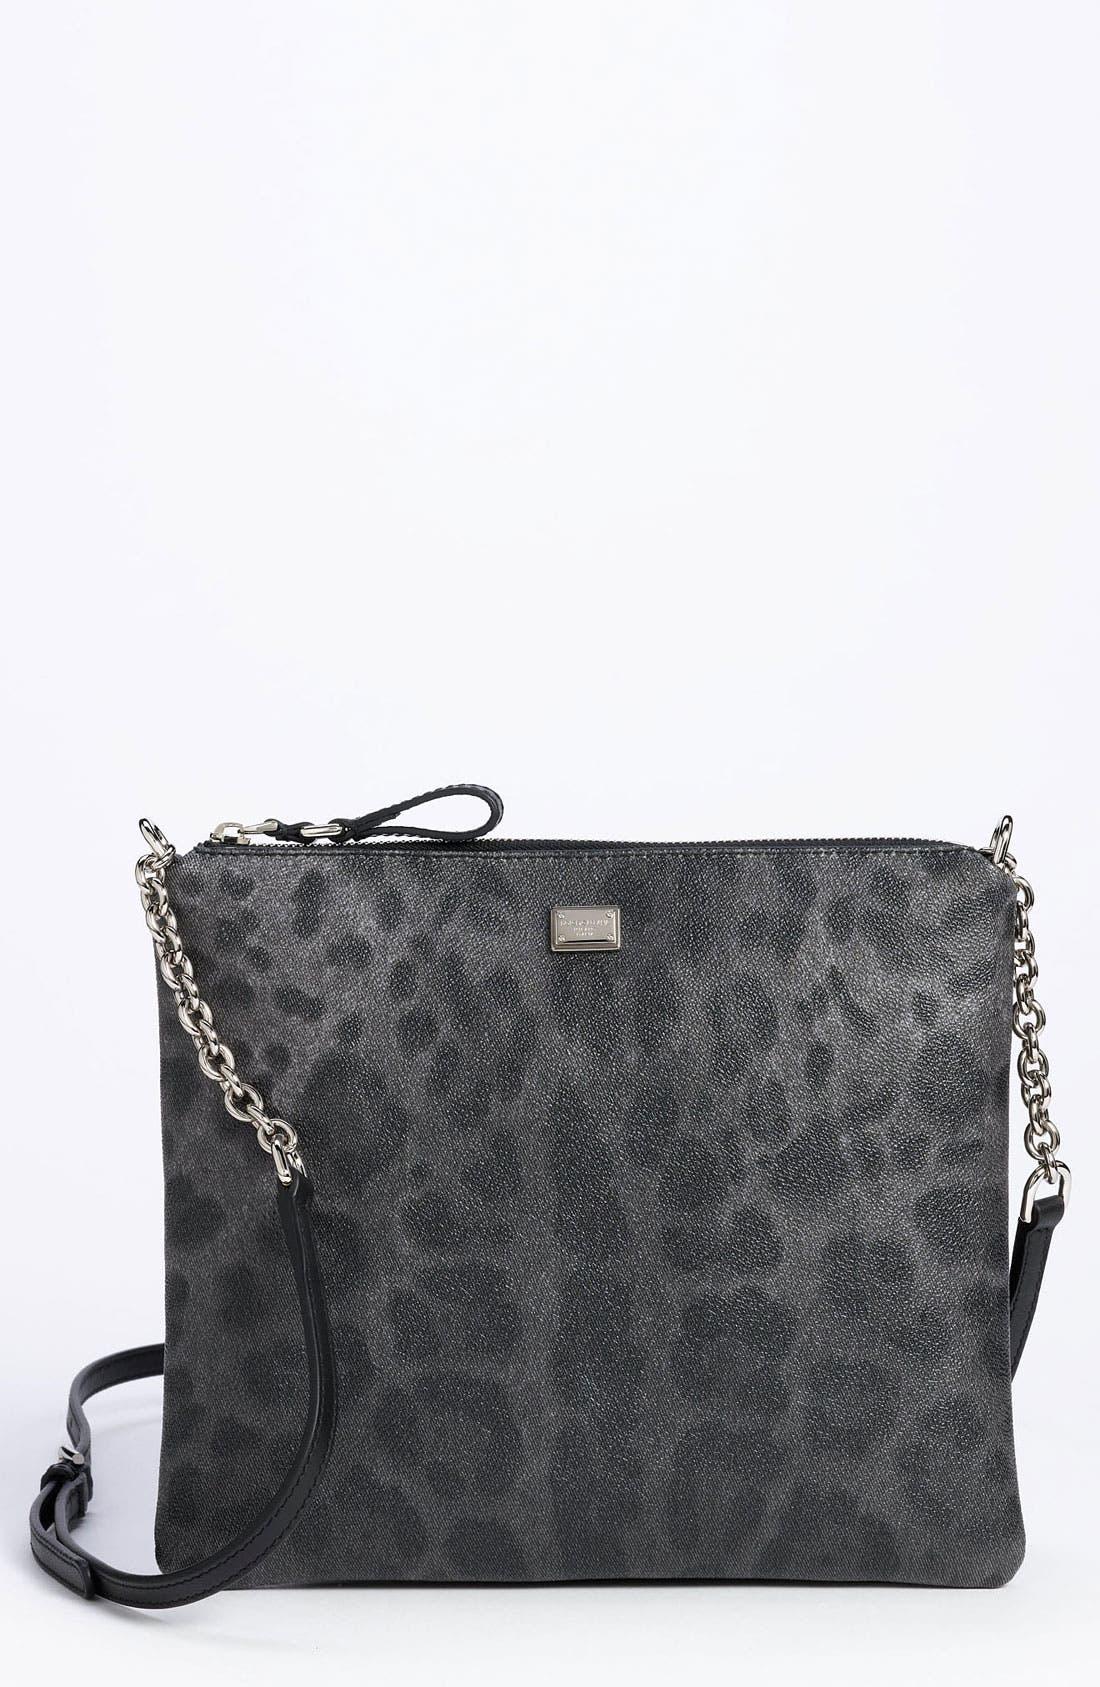 Main Image - Dolce&Gabbana 'Miss Cleo' Crossbody Bag